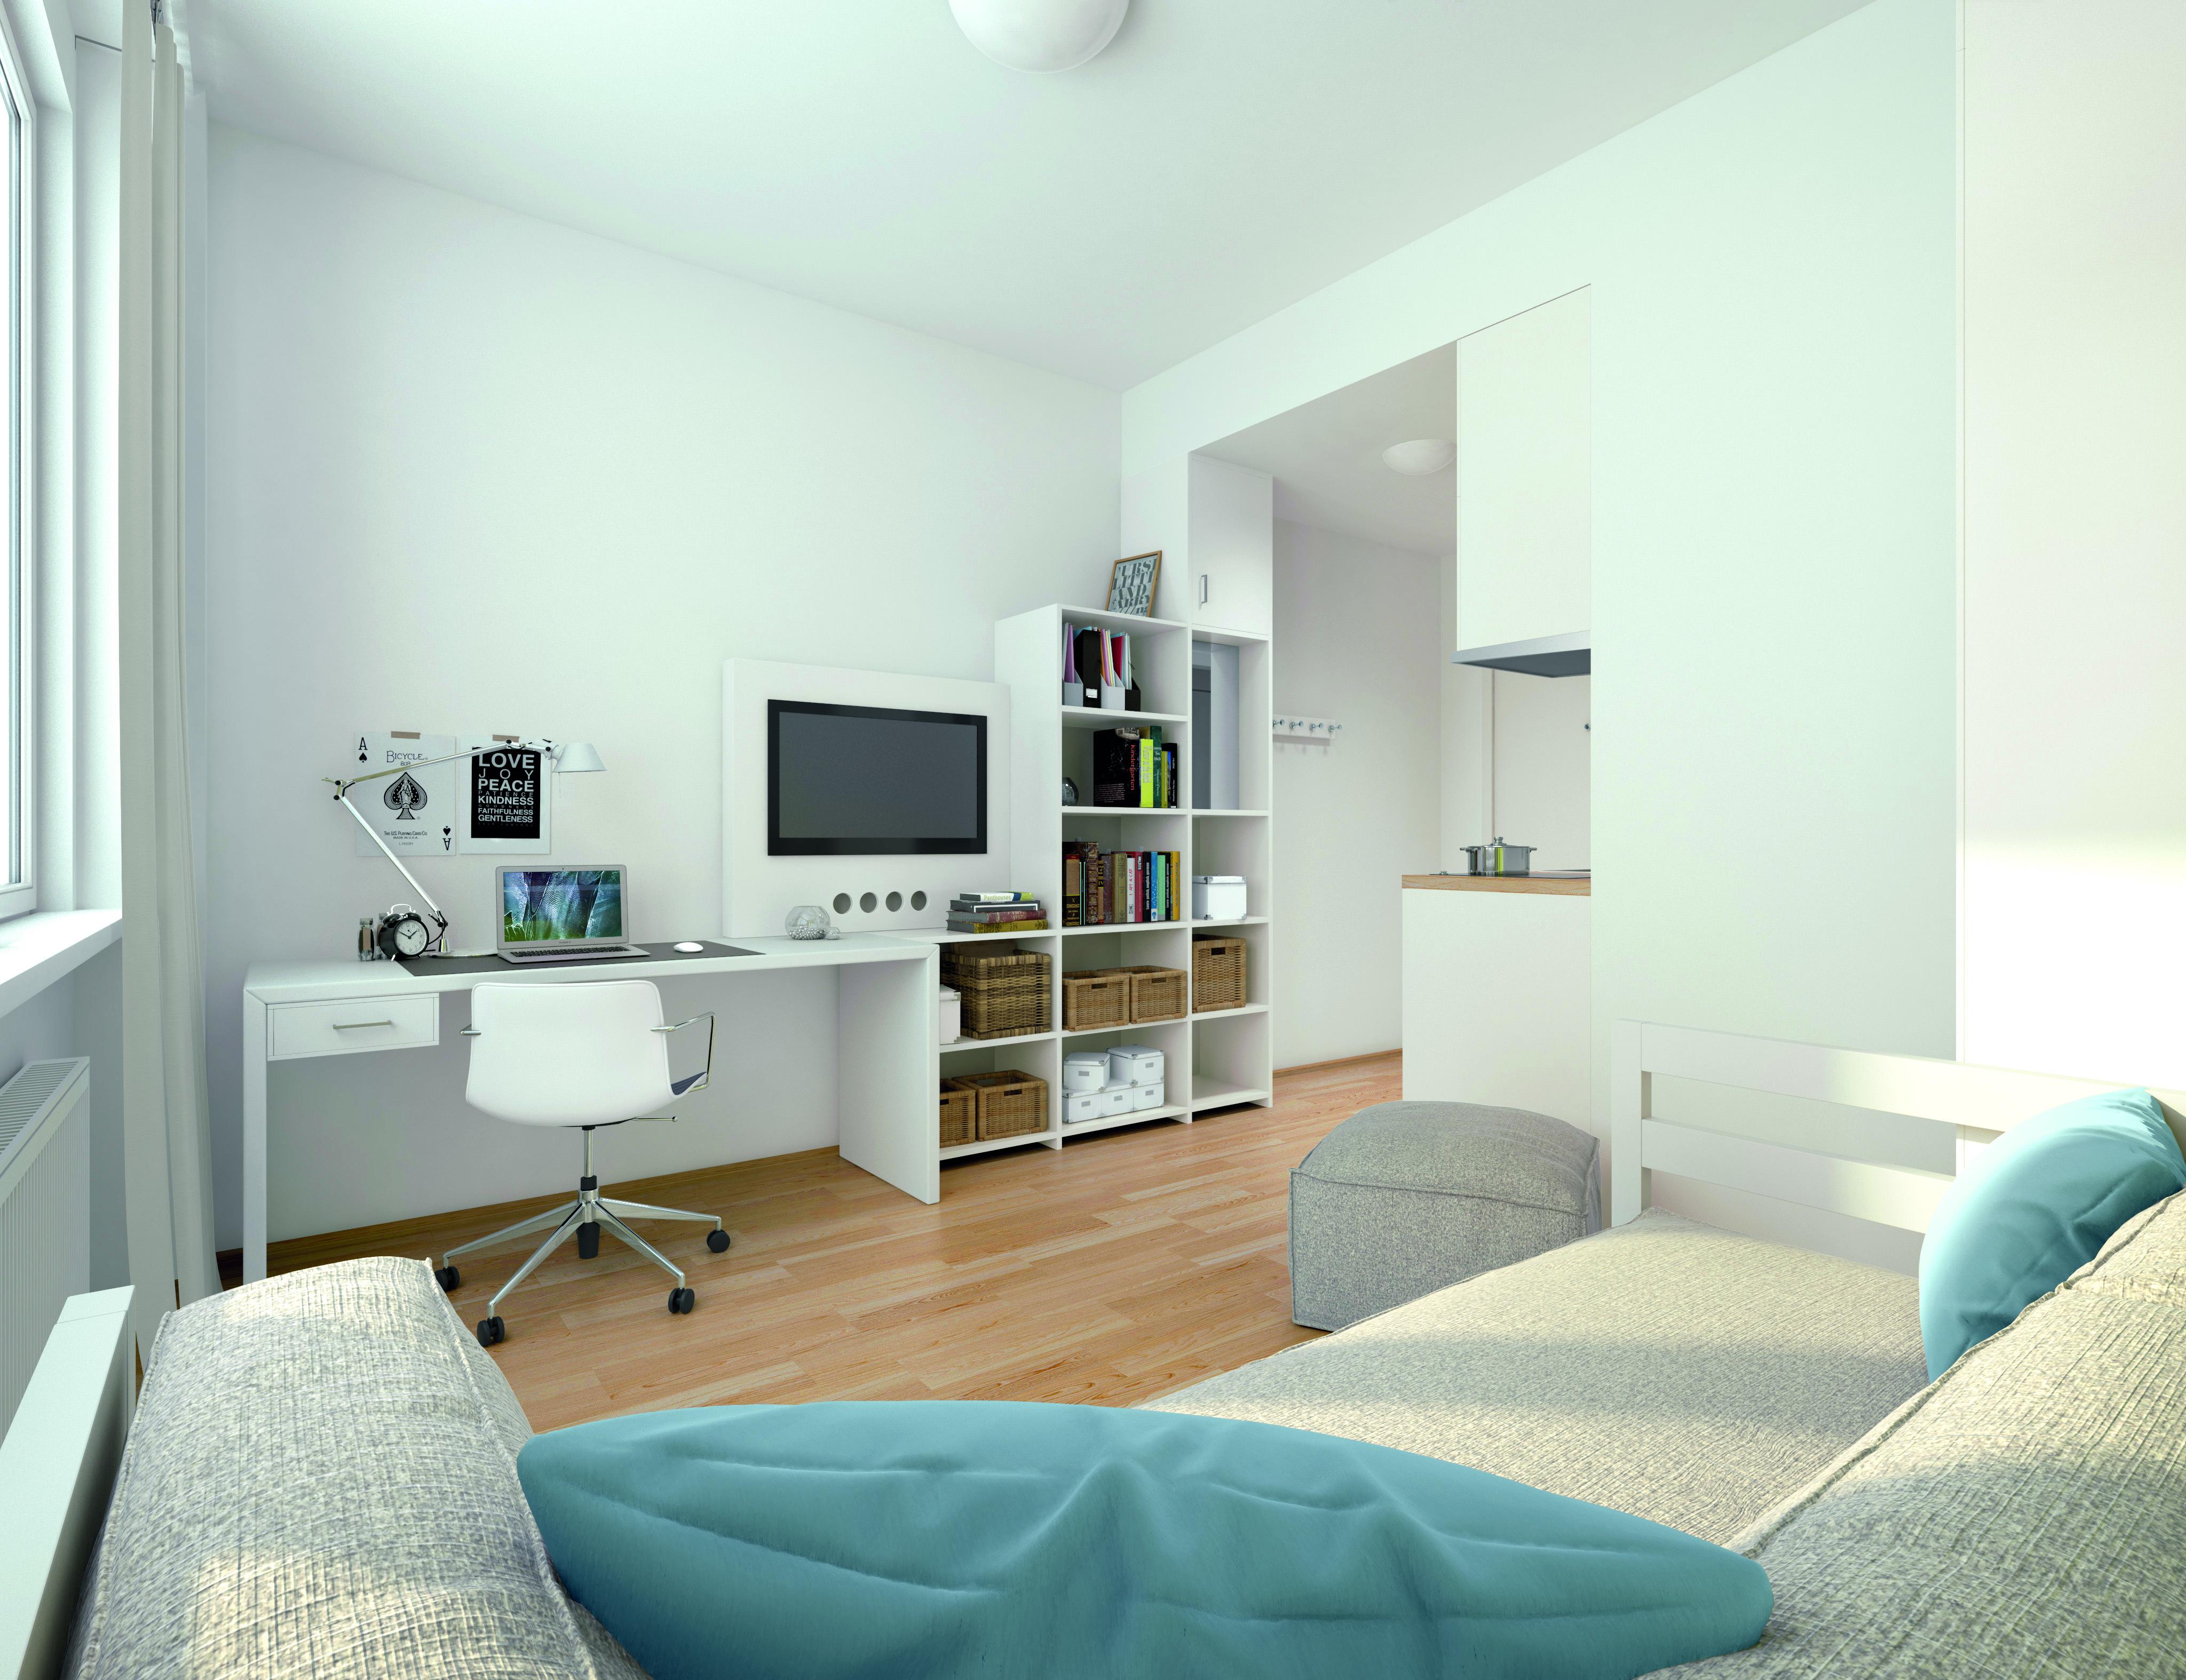 denkmallofts studentenwohnungen in hamburg ca 60 sonder afa govesta immobilien. Black Bedroom Furniture Sets. Home Design Ideas